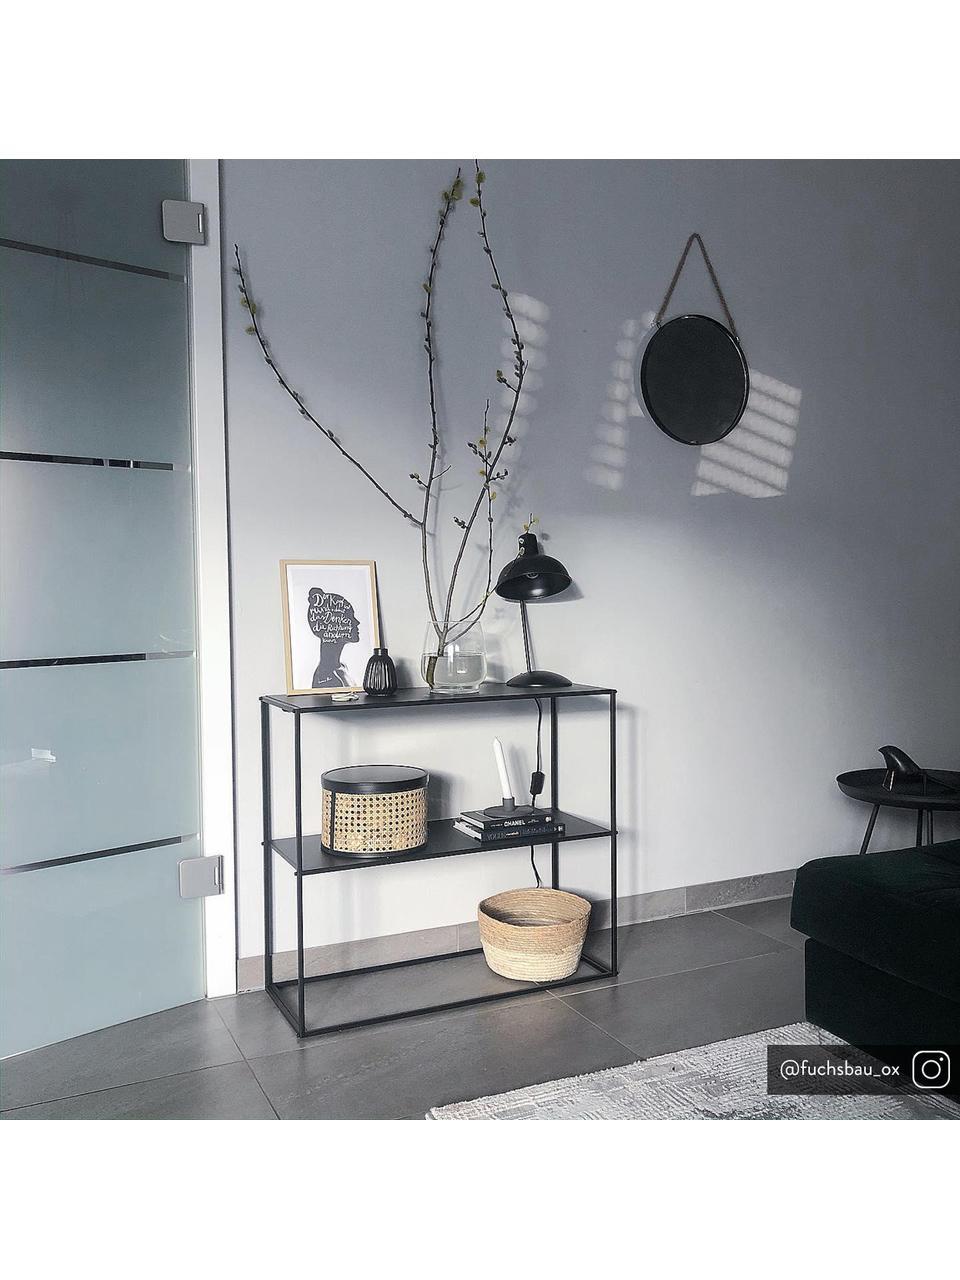 Retro tafellamp Hood, Lampenkap: gelakt metaal, Lampvoet: gelakt metaal, Lamp: zwart, messingkleurig. Lampenkap binnenzijde: wit, 20 x 38 cm